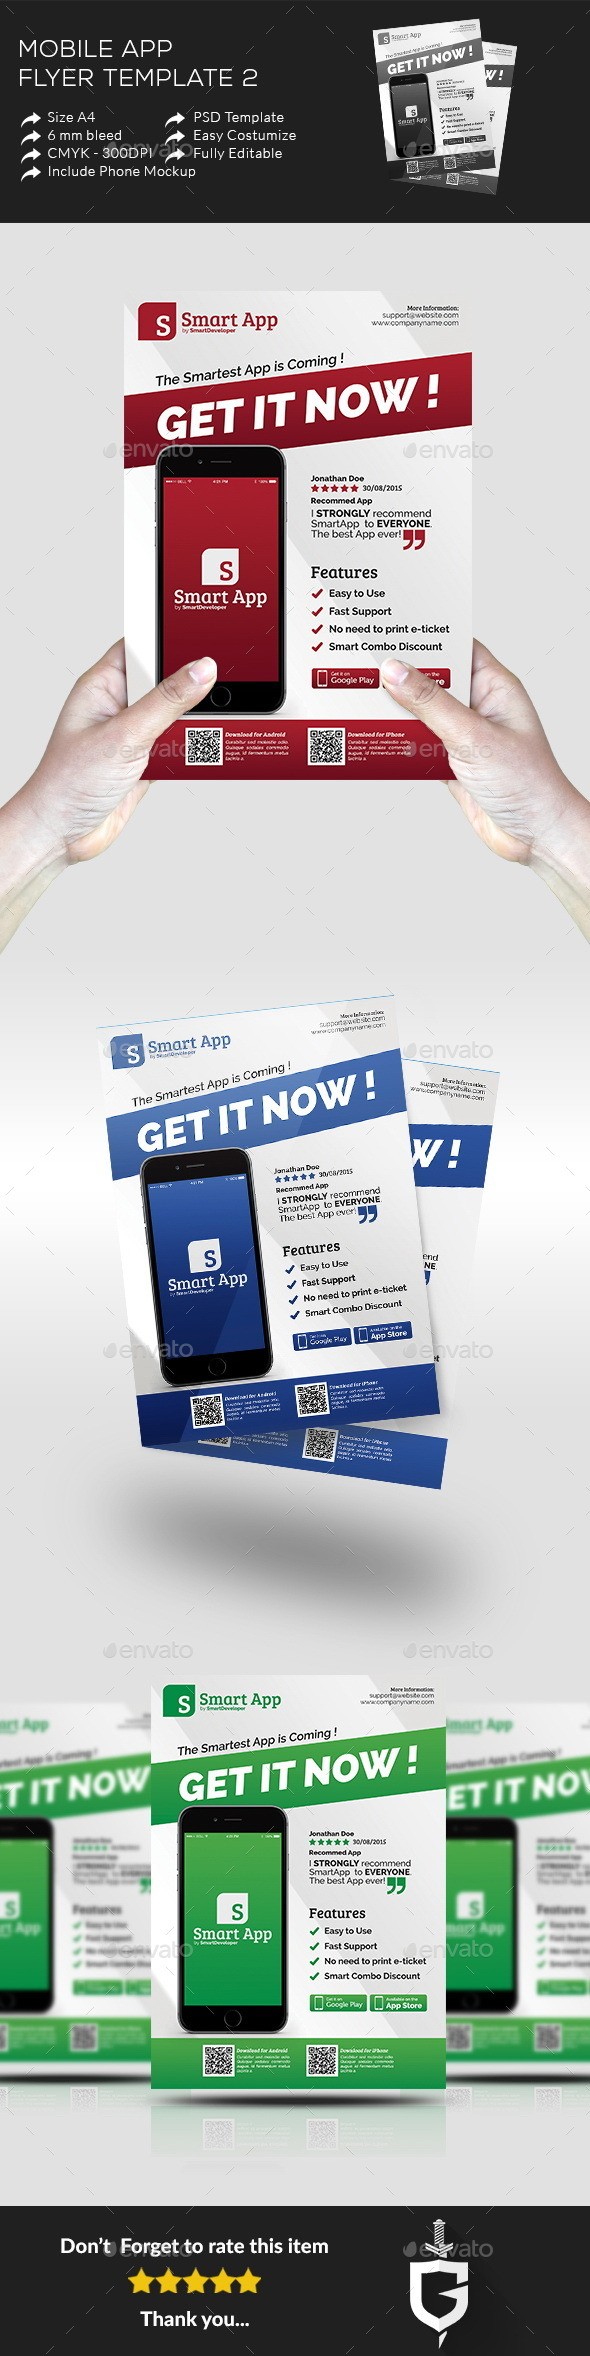 Mobile App Flyer Template 2